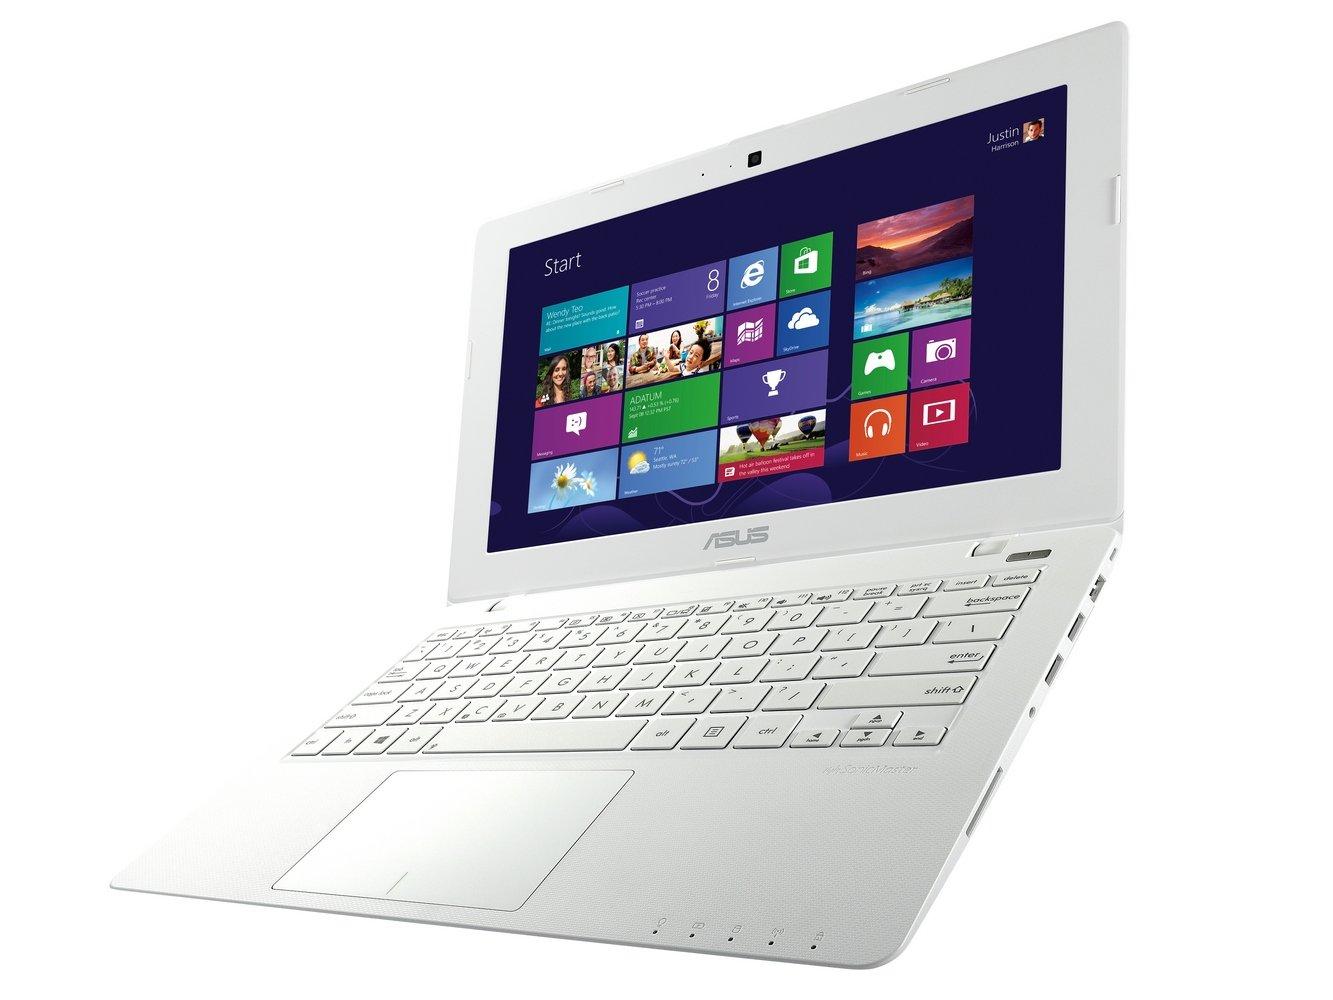 ASUS X200MA NB / black (WIN8.1 64bit / 11.6inch / Celeron N2830 / 4G / 750GB HDD) X200MA-KXBLACK B00K737PZ8 ホワイト ホワイト, セレクトショップhale plus 4907275e